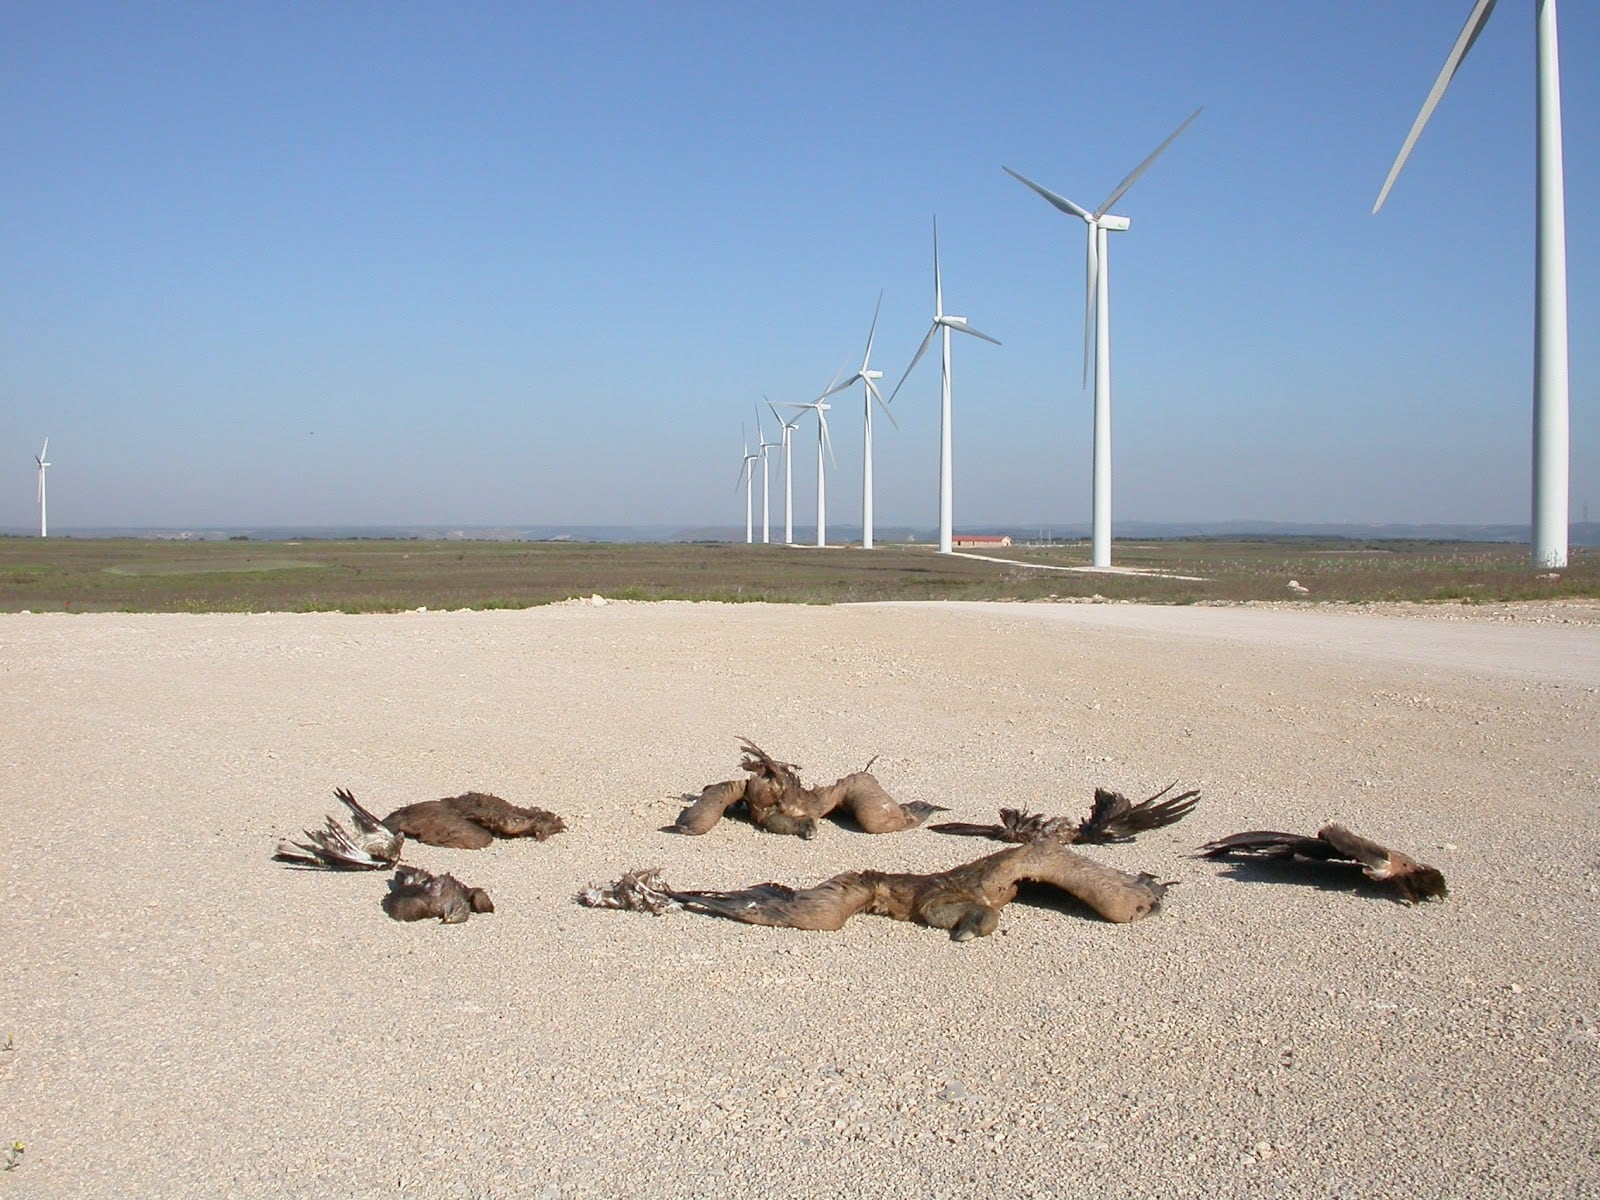 Un parc eòlic amenaça les aus de Monfragüe. Campanya de signatures